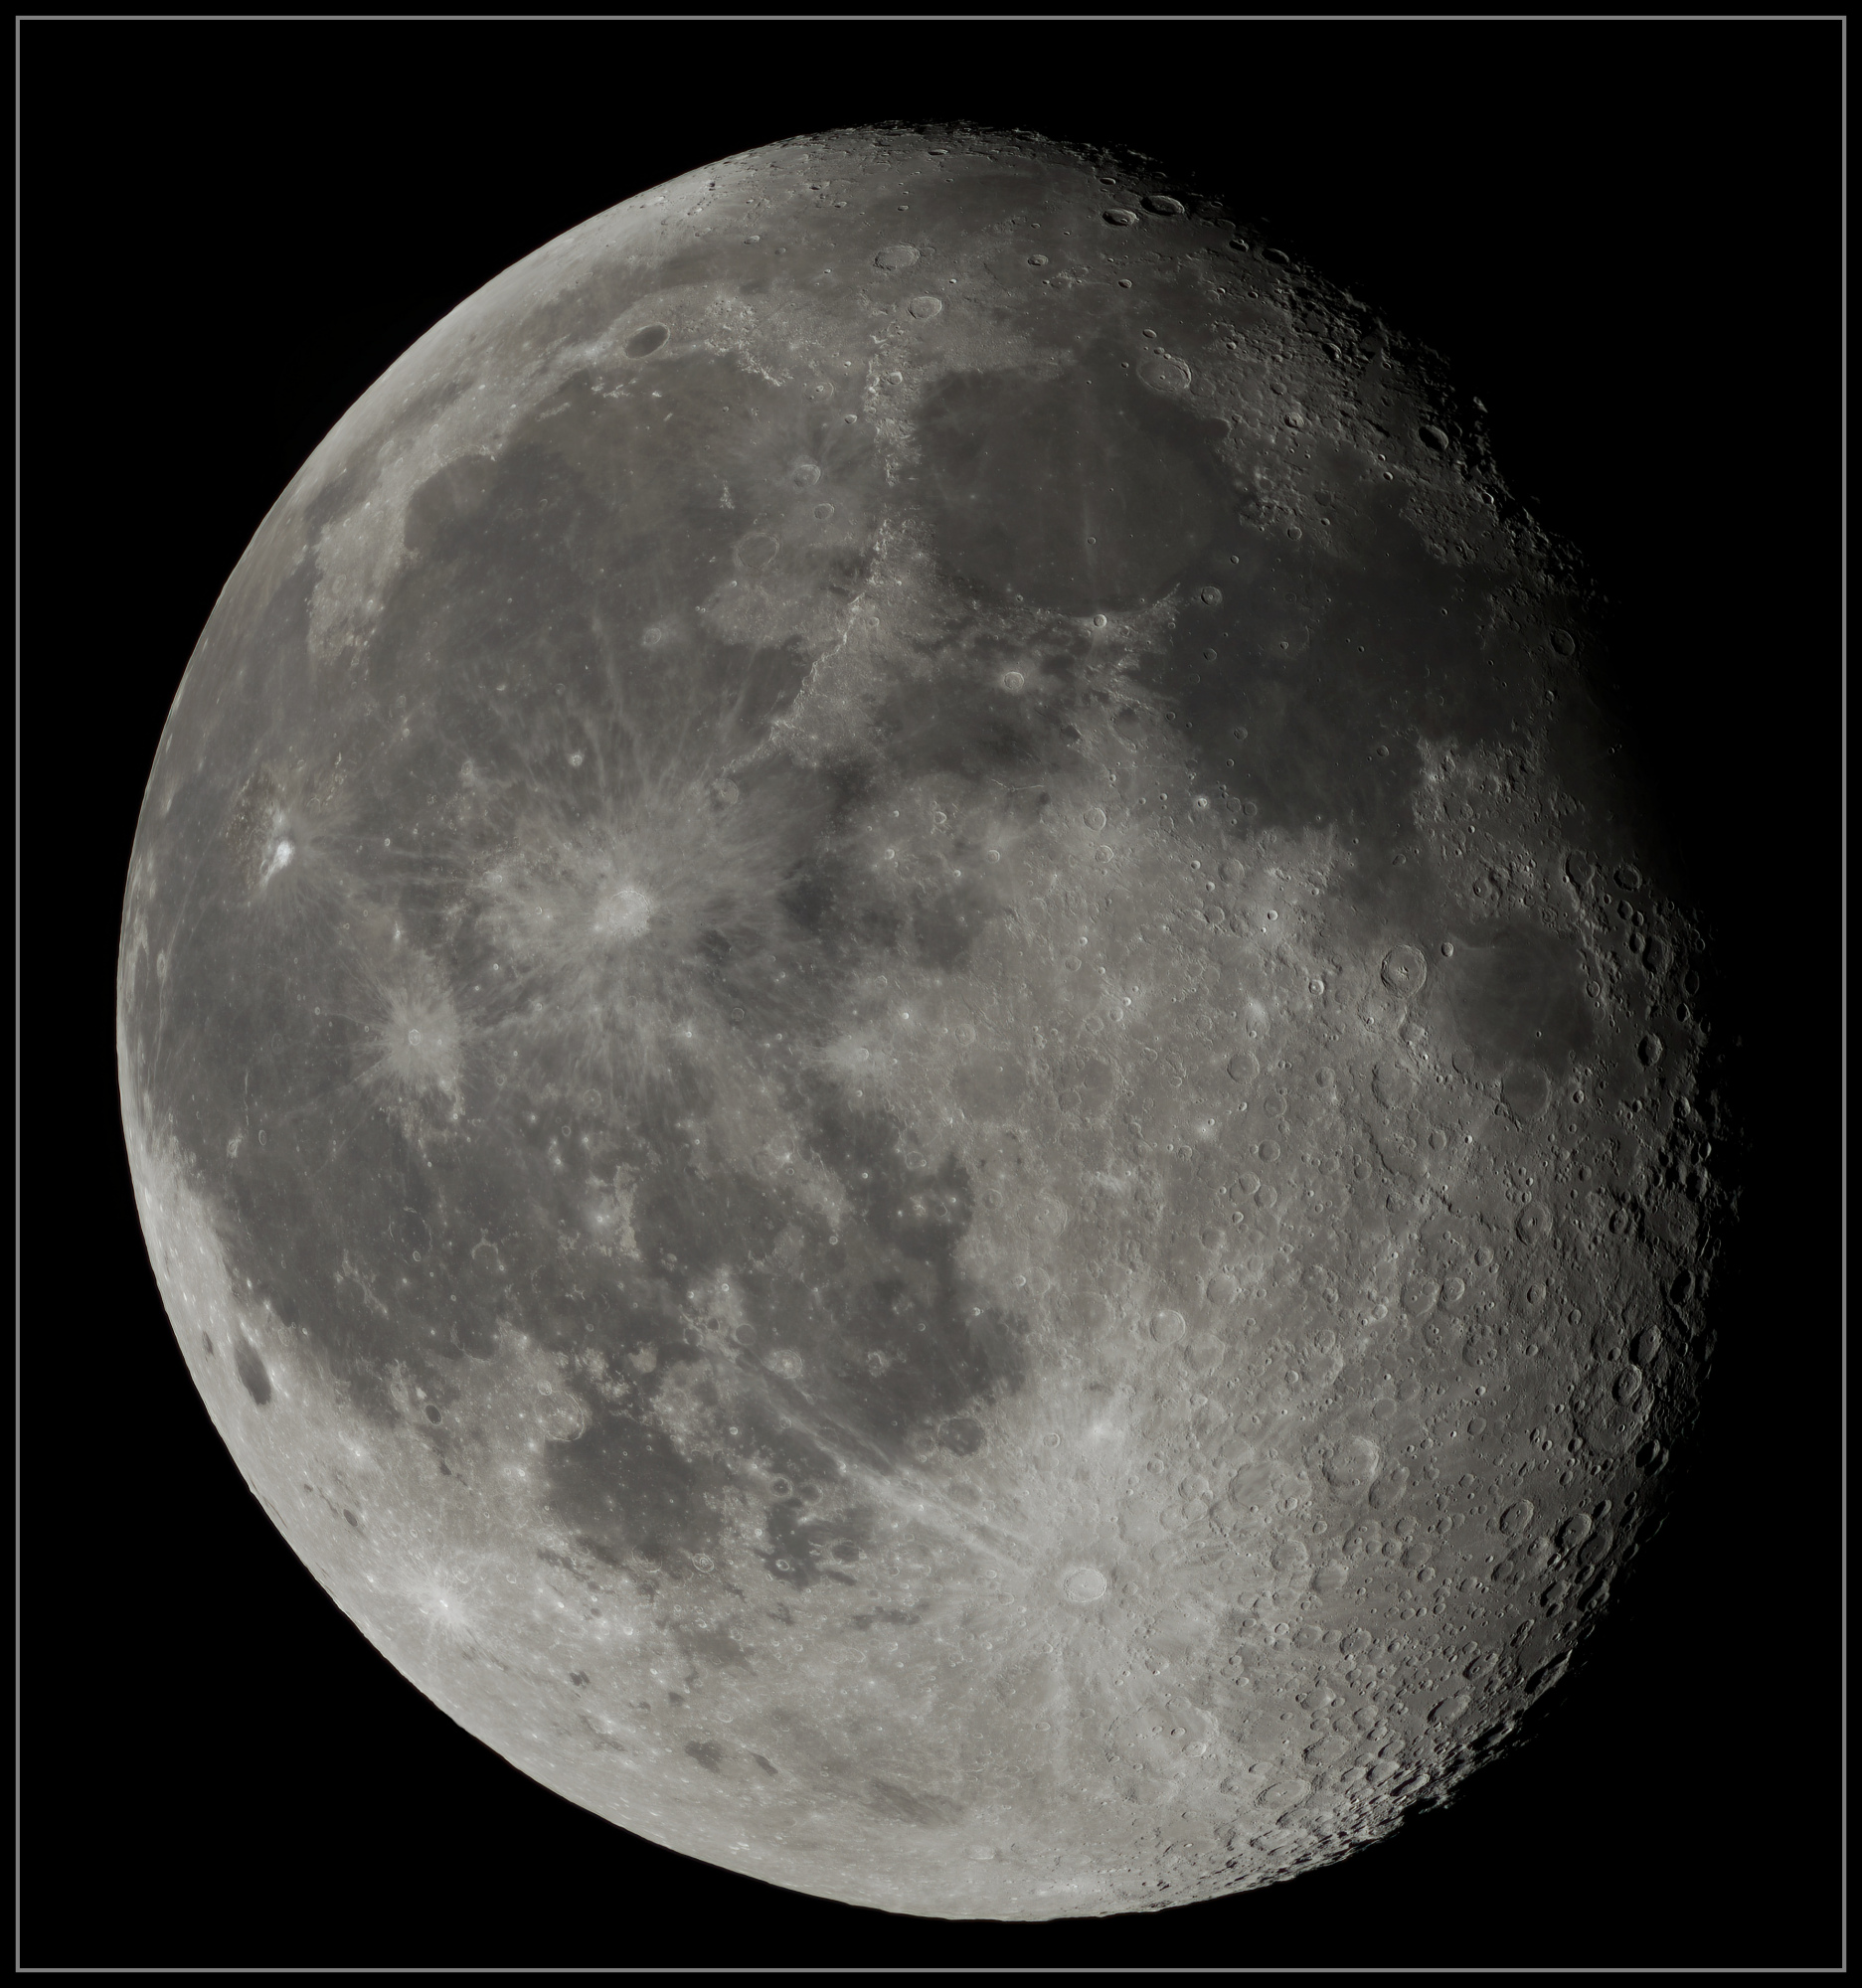 5e56c8b28722f_Moon_054330_120220_ZWOASI224MC_RGB_AS_P25_lapl4_ap325_stitch-sharpen-sharpen-finale.thumb.jpg.22e764d7c6ff930275f807f4dce46eae.jpg